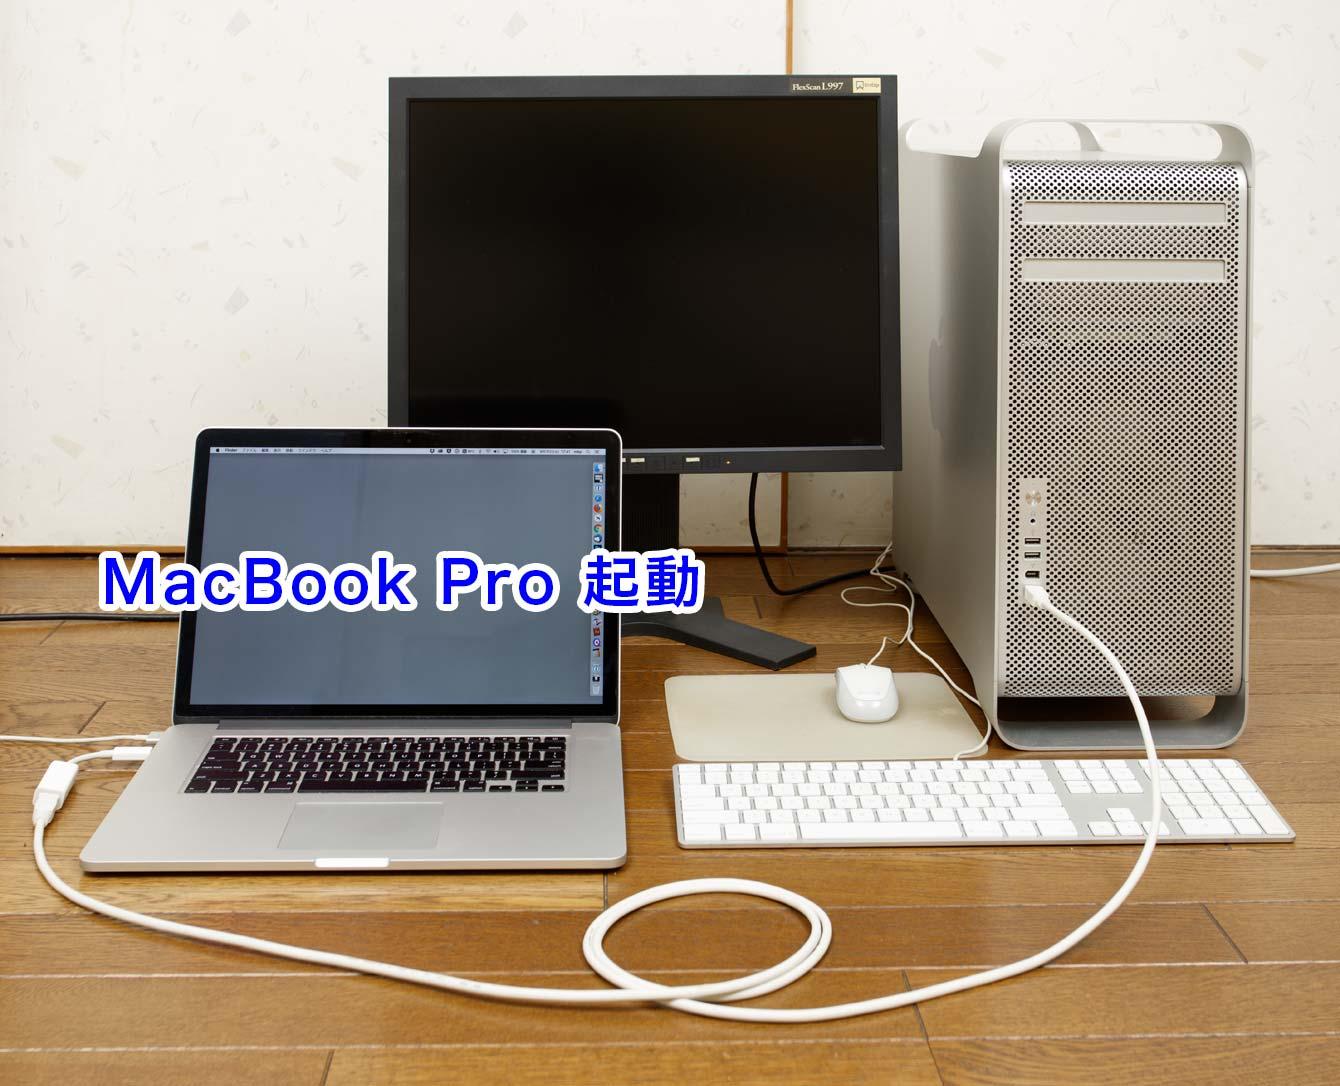 MacBook Proを起動